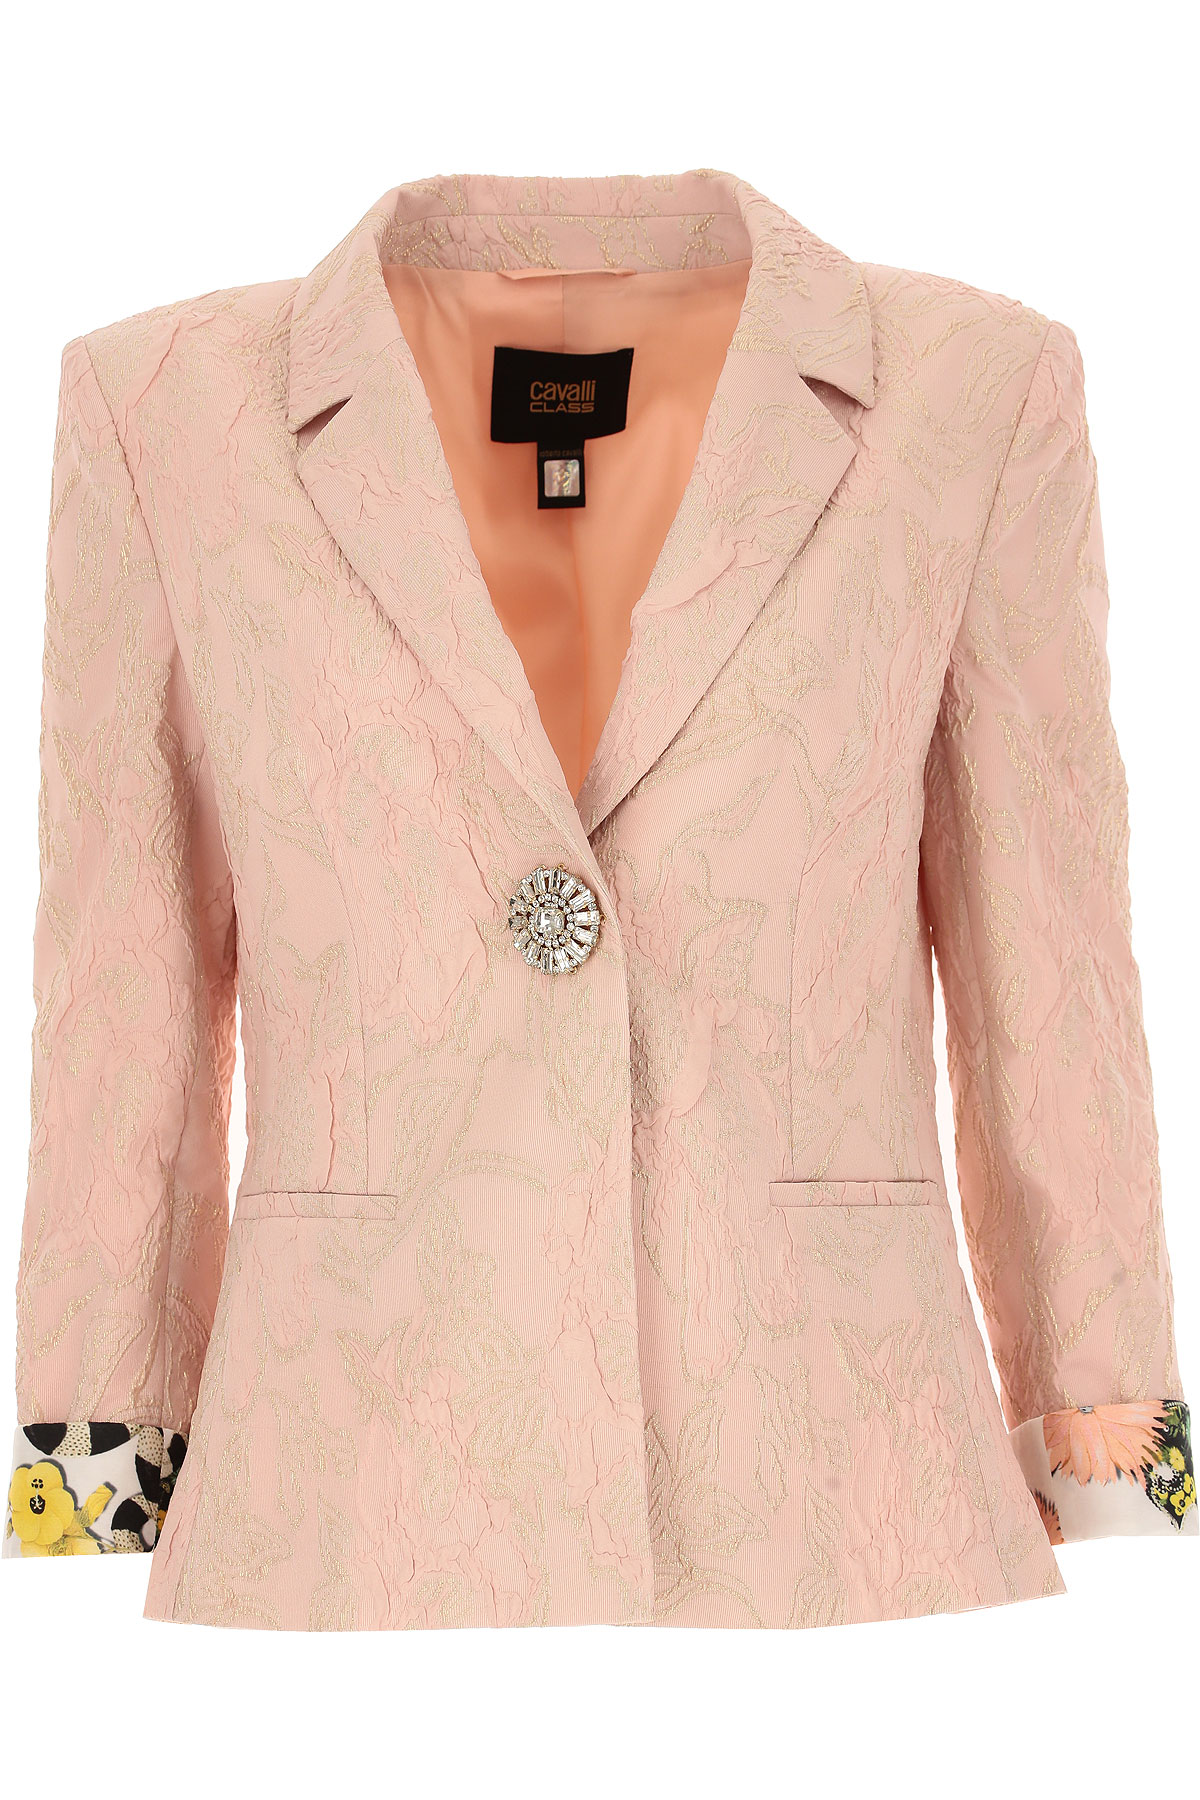 Image of Roberto Cavalli Blazer for Women On Sale, Dust Rose, polyamide, 2017, 10 12 6 8